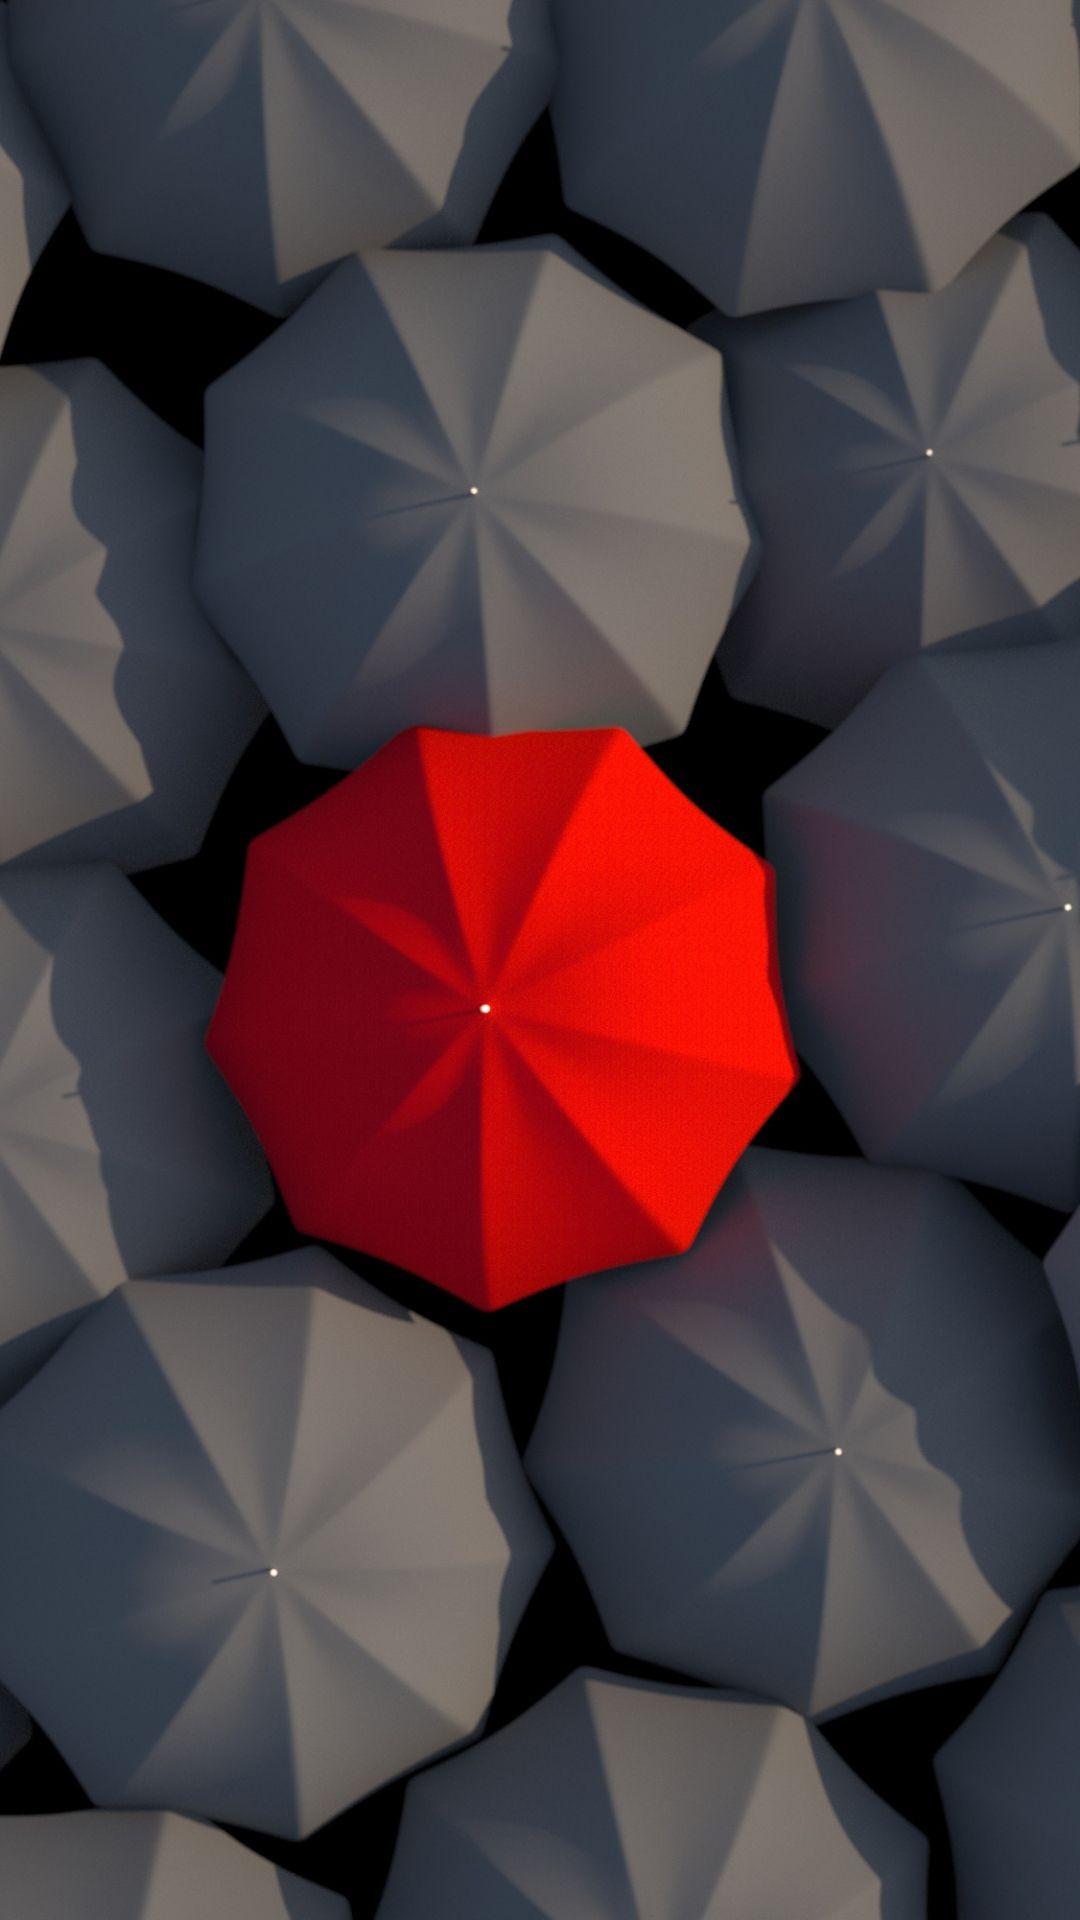 Umbrellas 3d Red Gray Iphone 6 Plus Wallpaper Grey Wallpaper Iphone 3d Wallpaper Iphone Samsung Wallpaper